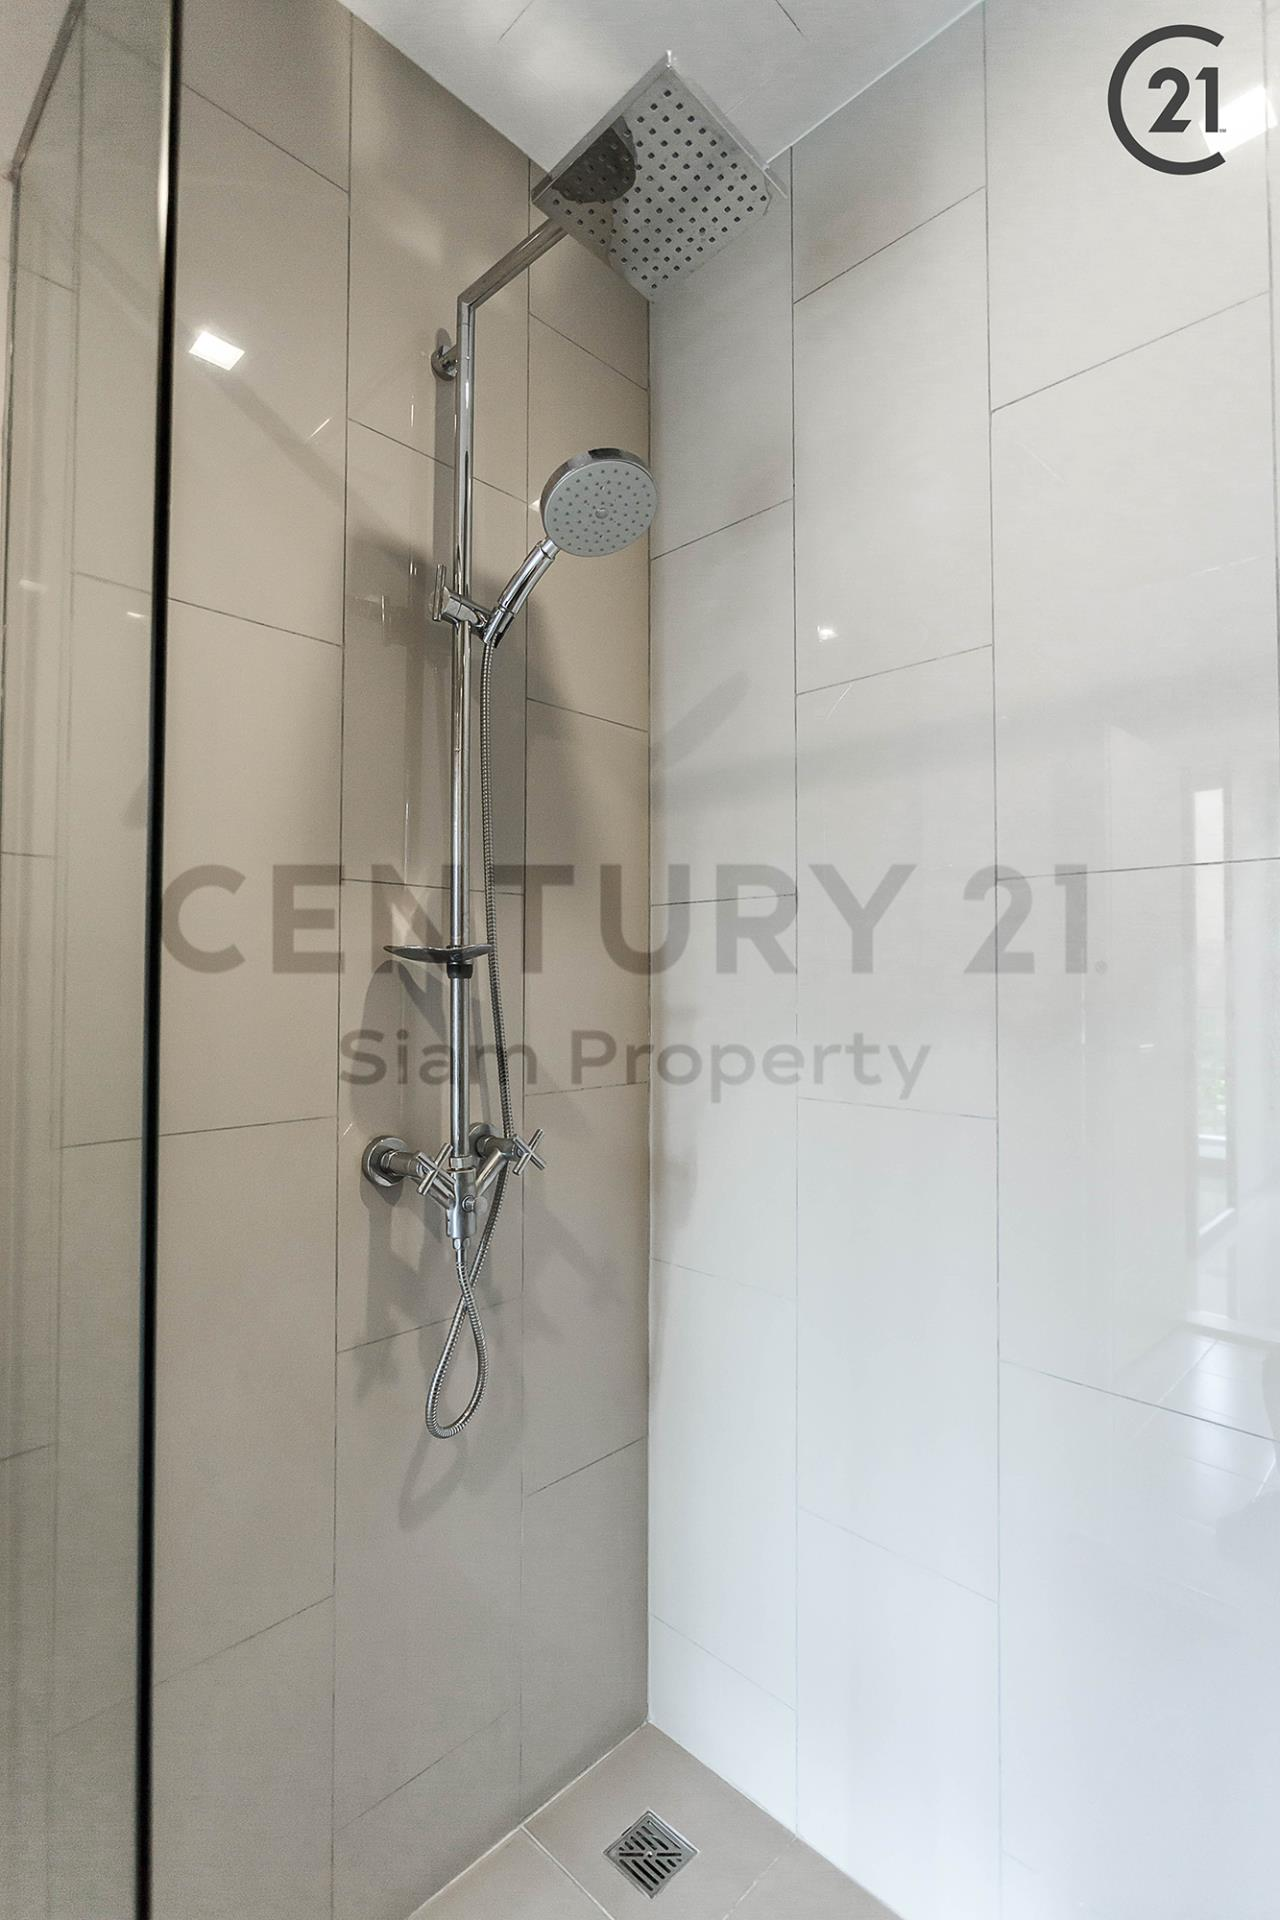 Century21 Siam Property Agency's Hasu Haus  13